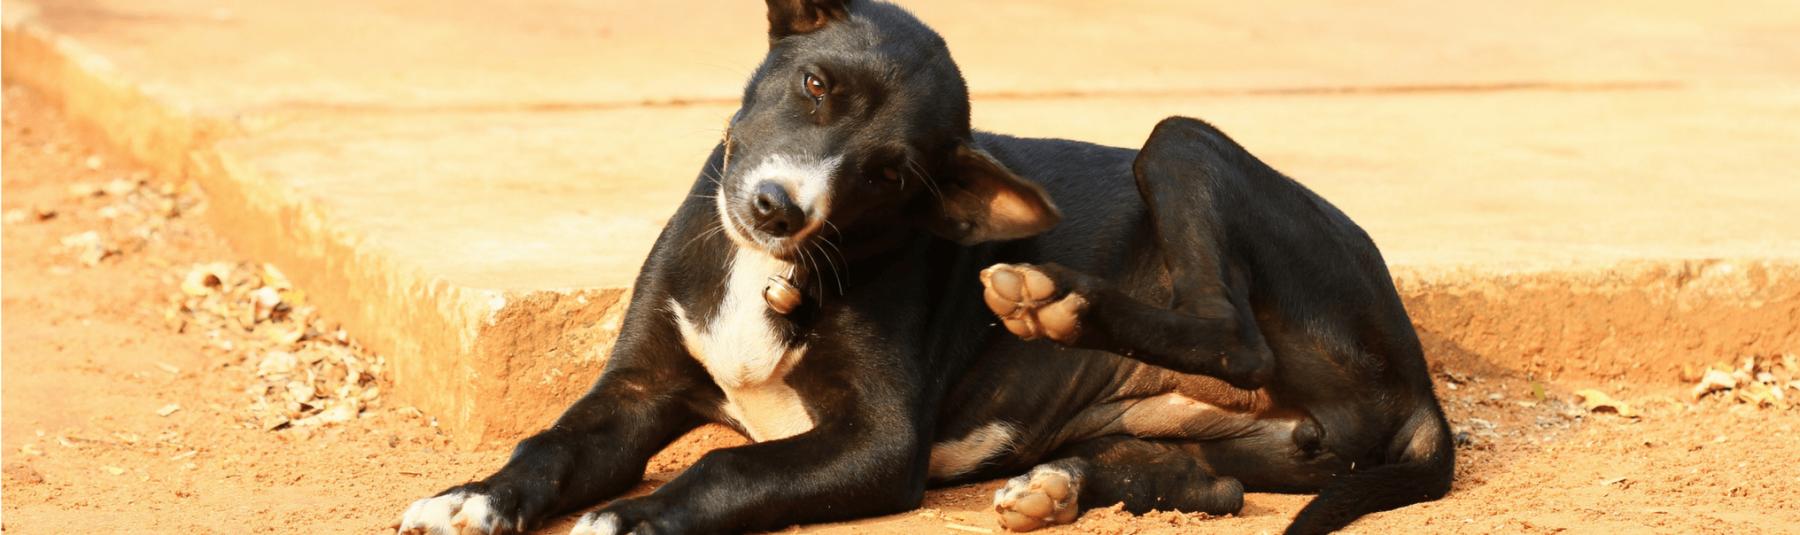 A dog scratching fleas